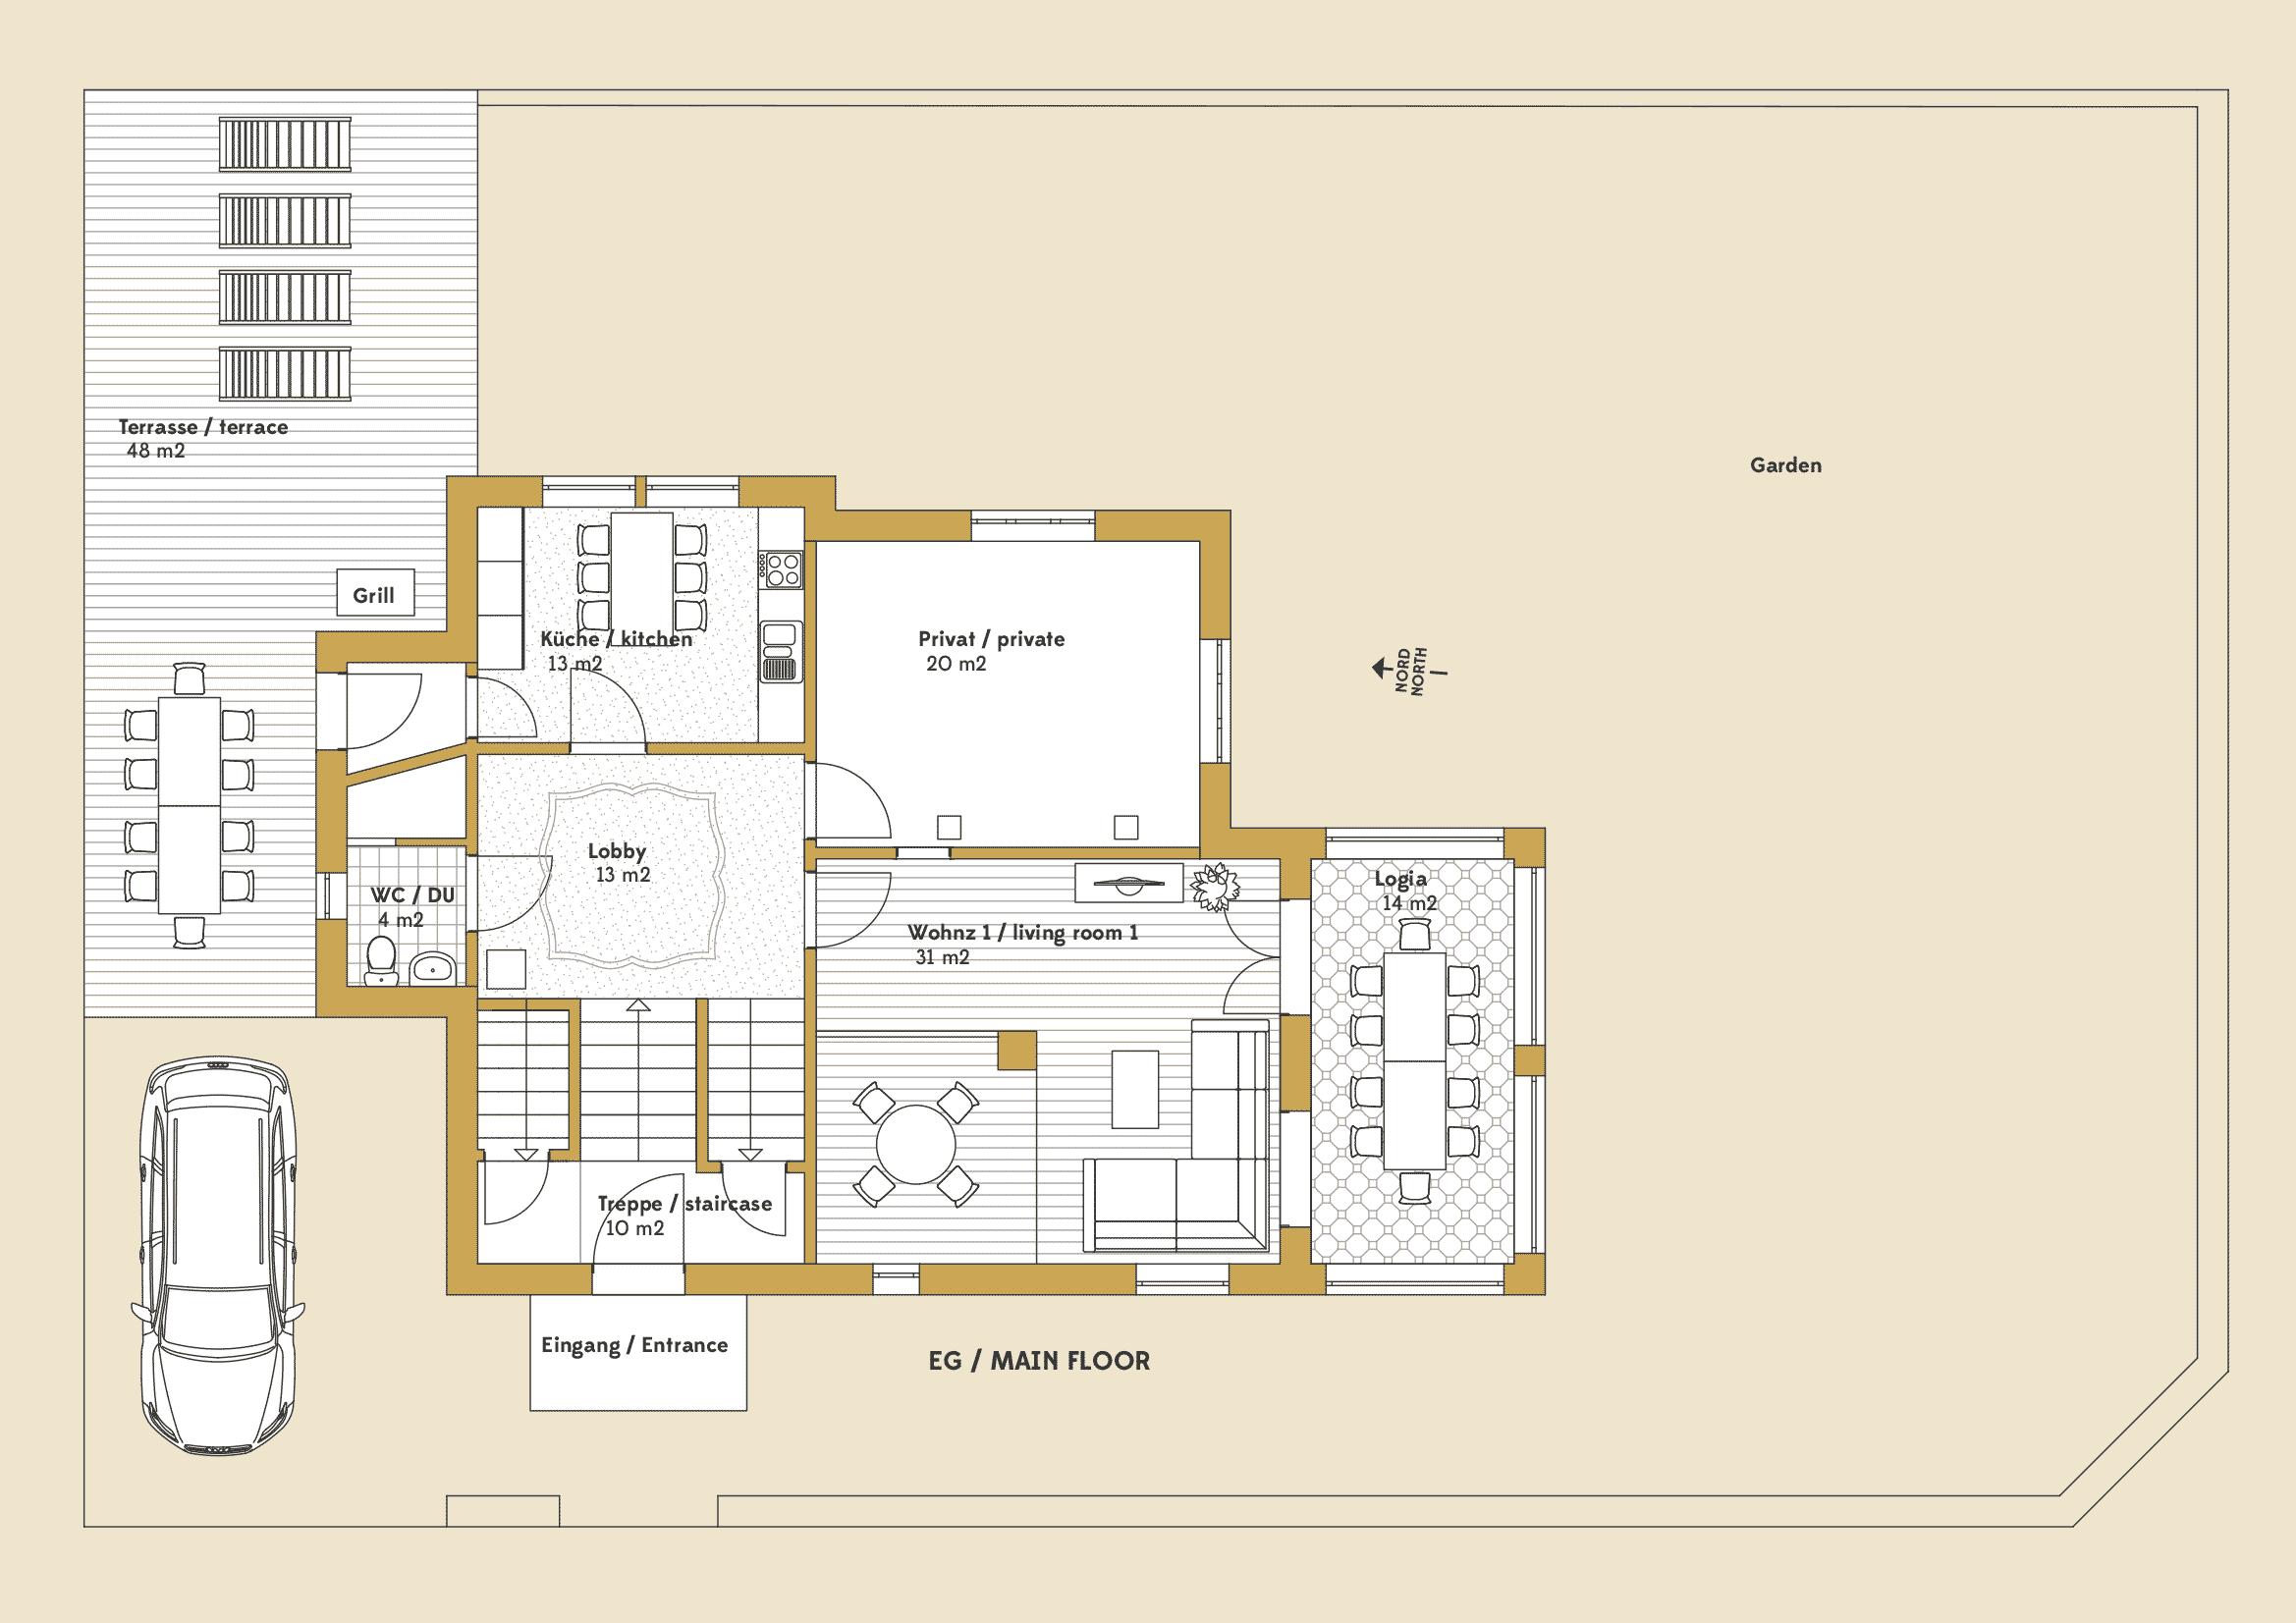 Erdgeschoss / main floor